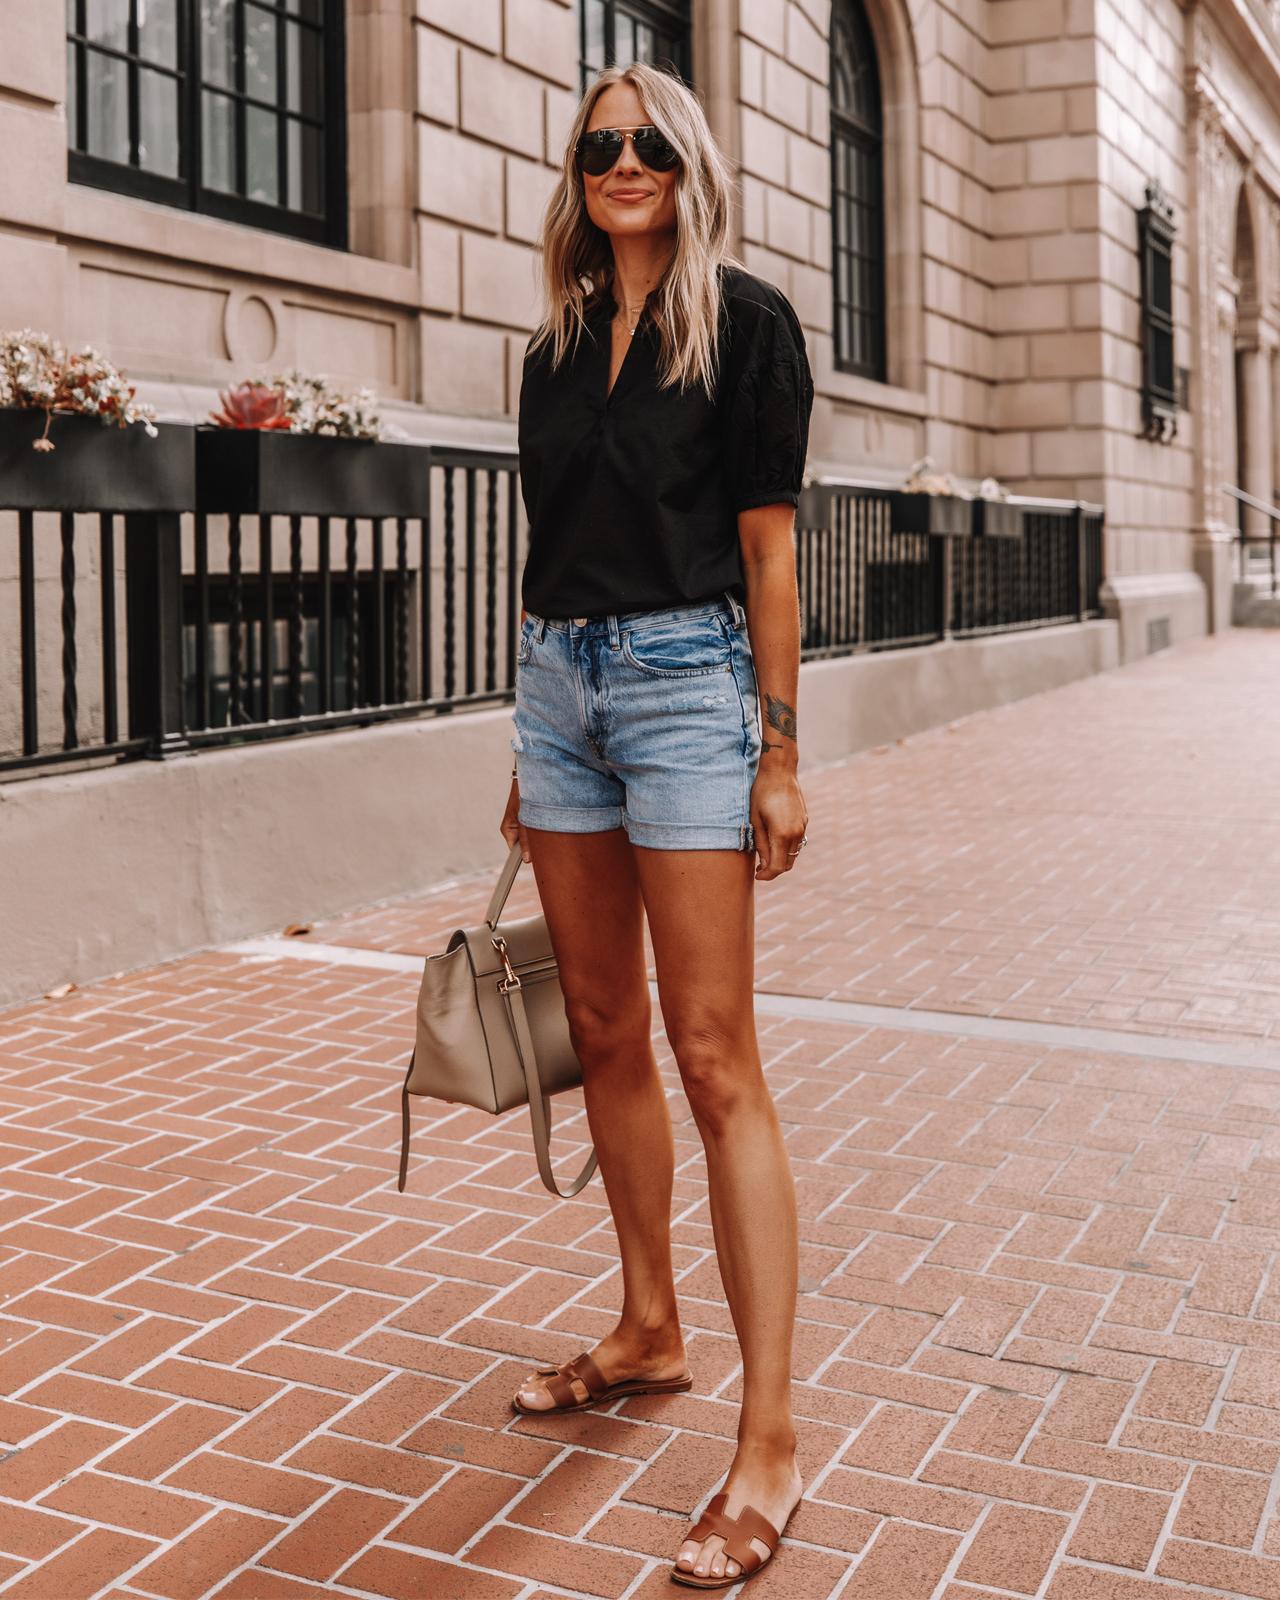 Fashion Jackson Wearing Everlane Black Puff Sleeve Top Everlane Denim Shorts Tan Sandals